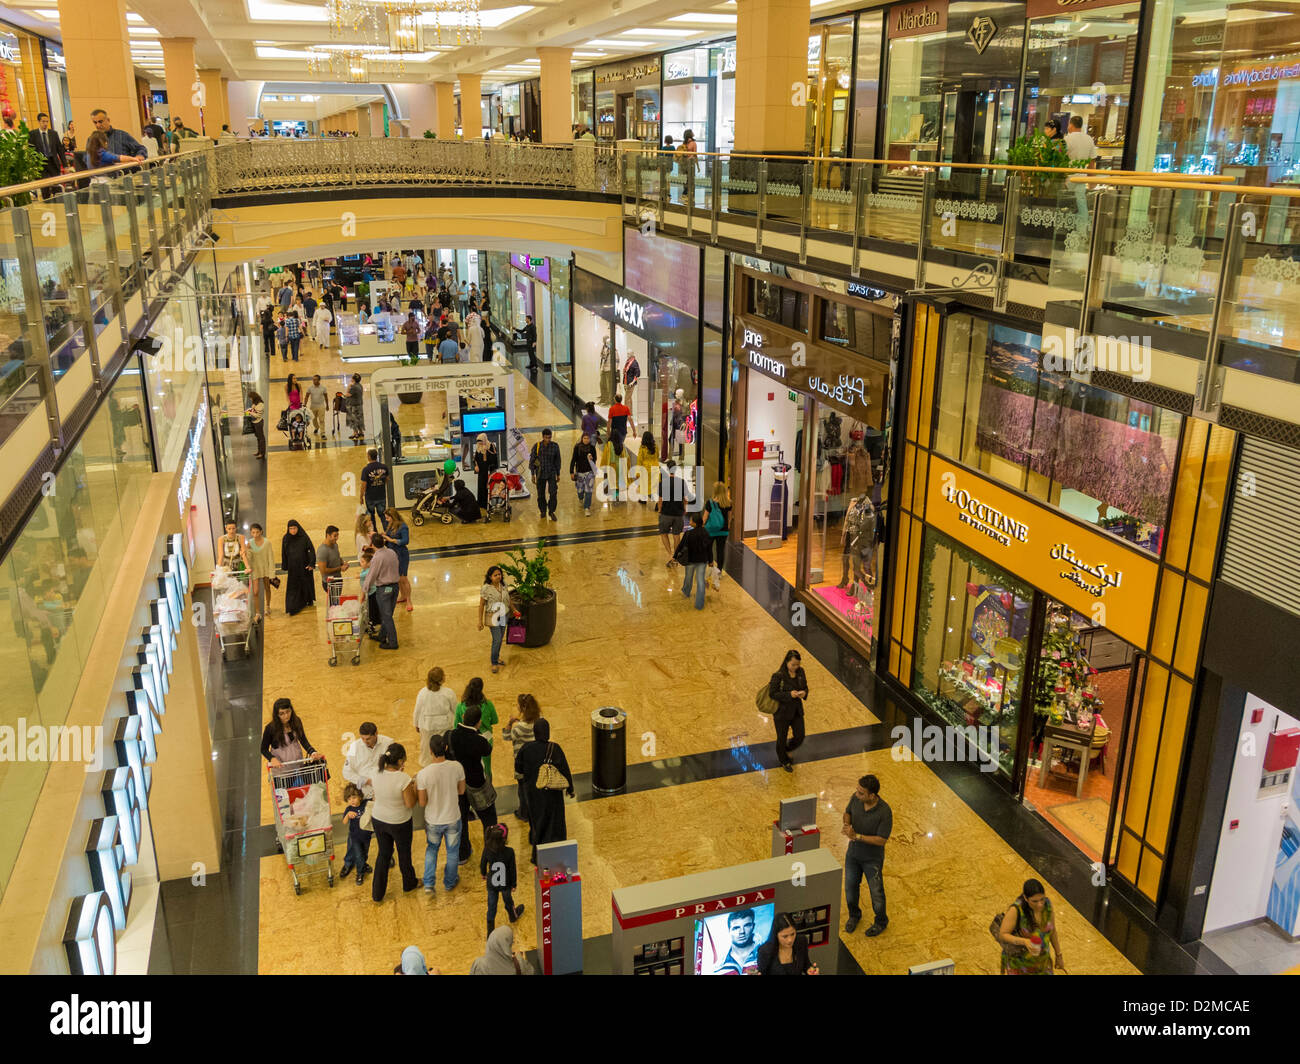 The shopping Mall of the Emirates, Dubai - Stock Image